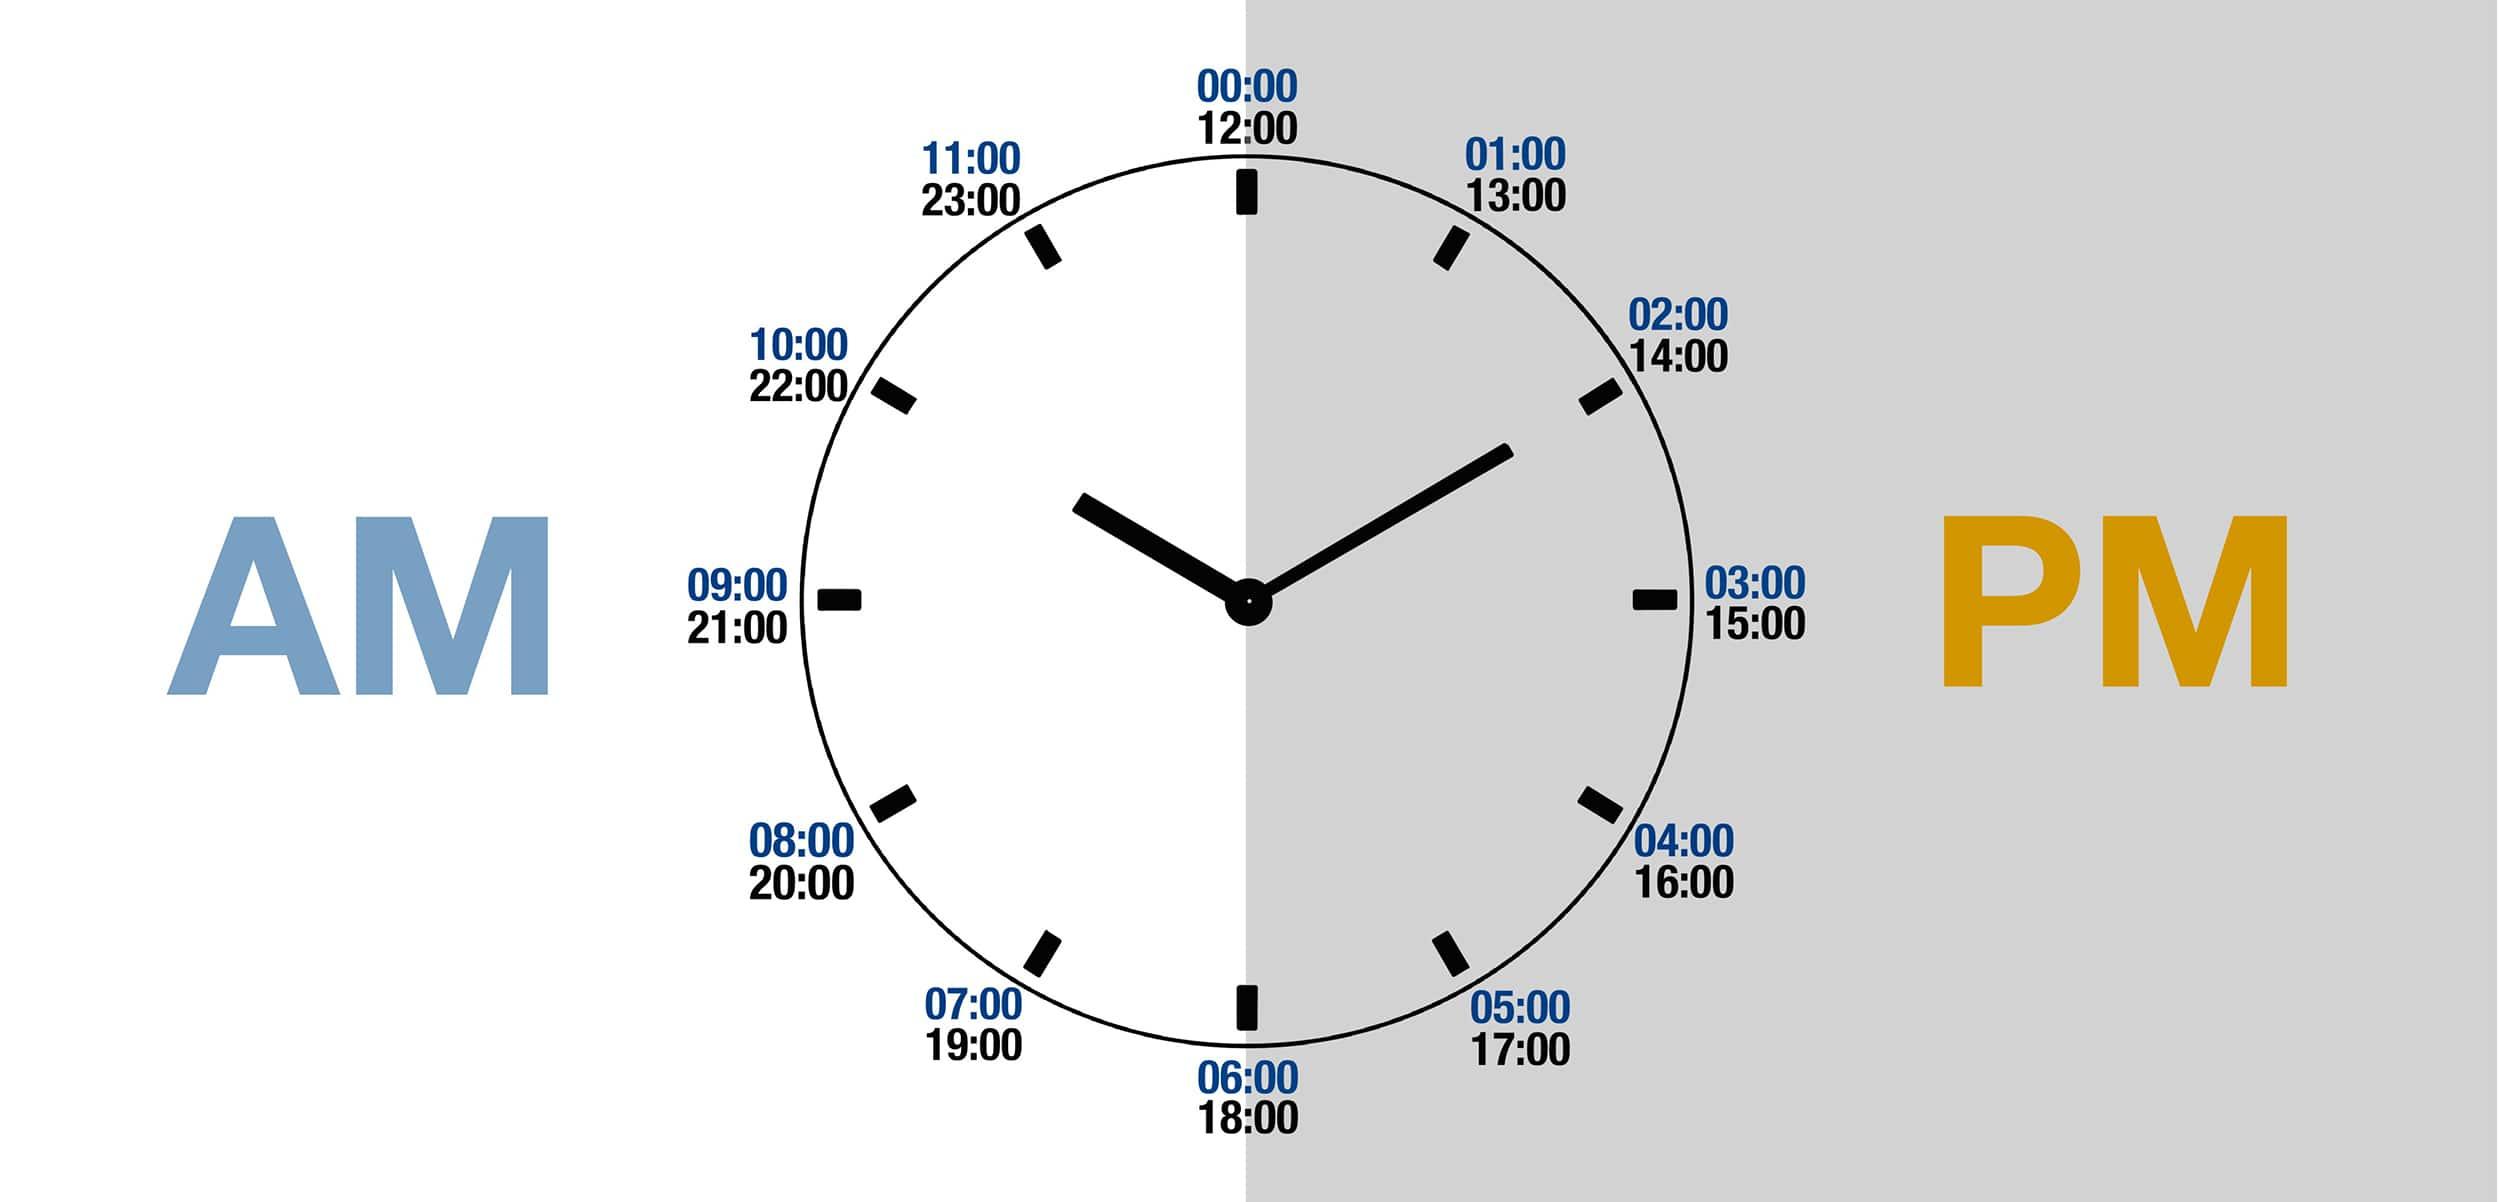 تبدیل 24 ساعته به 12 ساعته